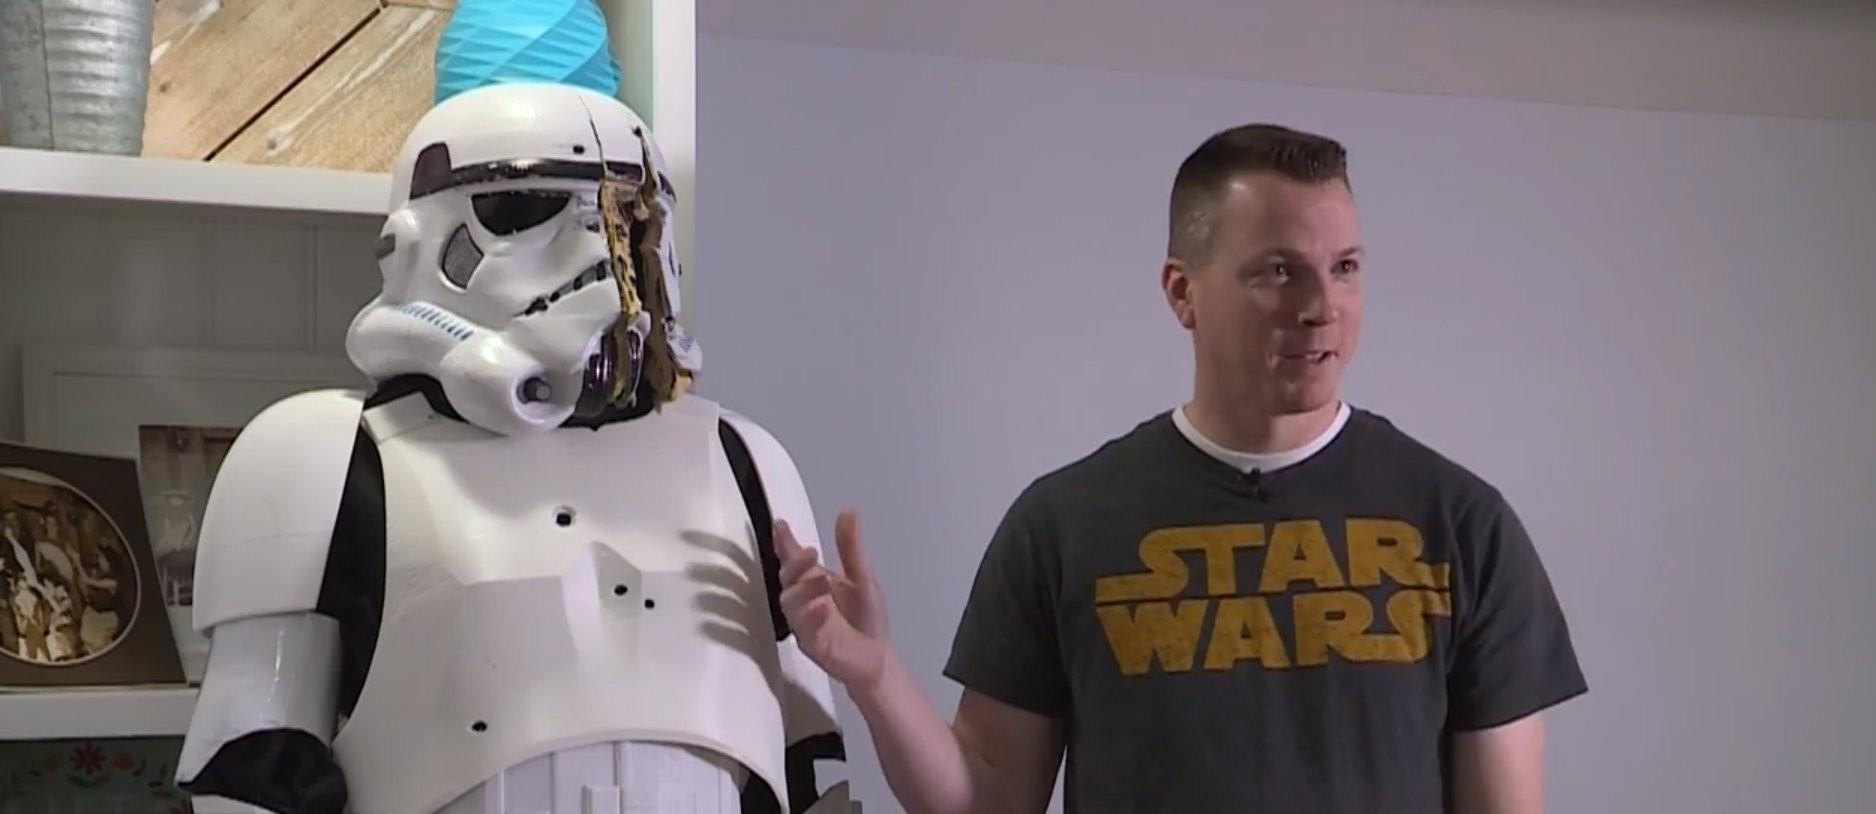 L'uniforme da Stormtrooper stampata in 3D e a prova di proiettile